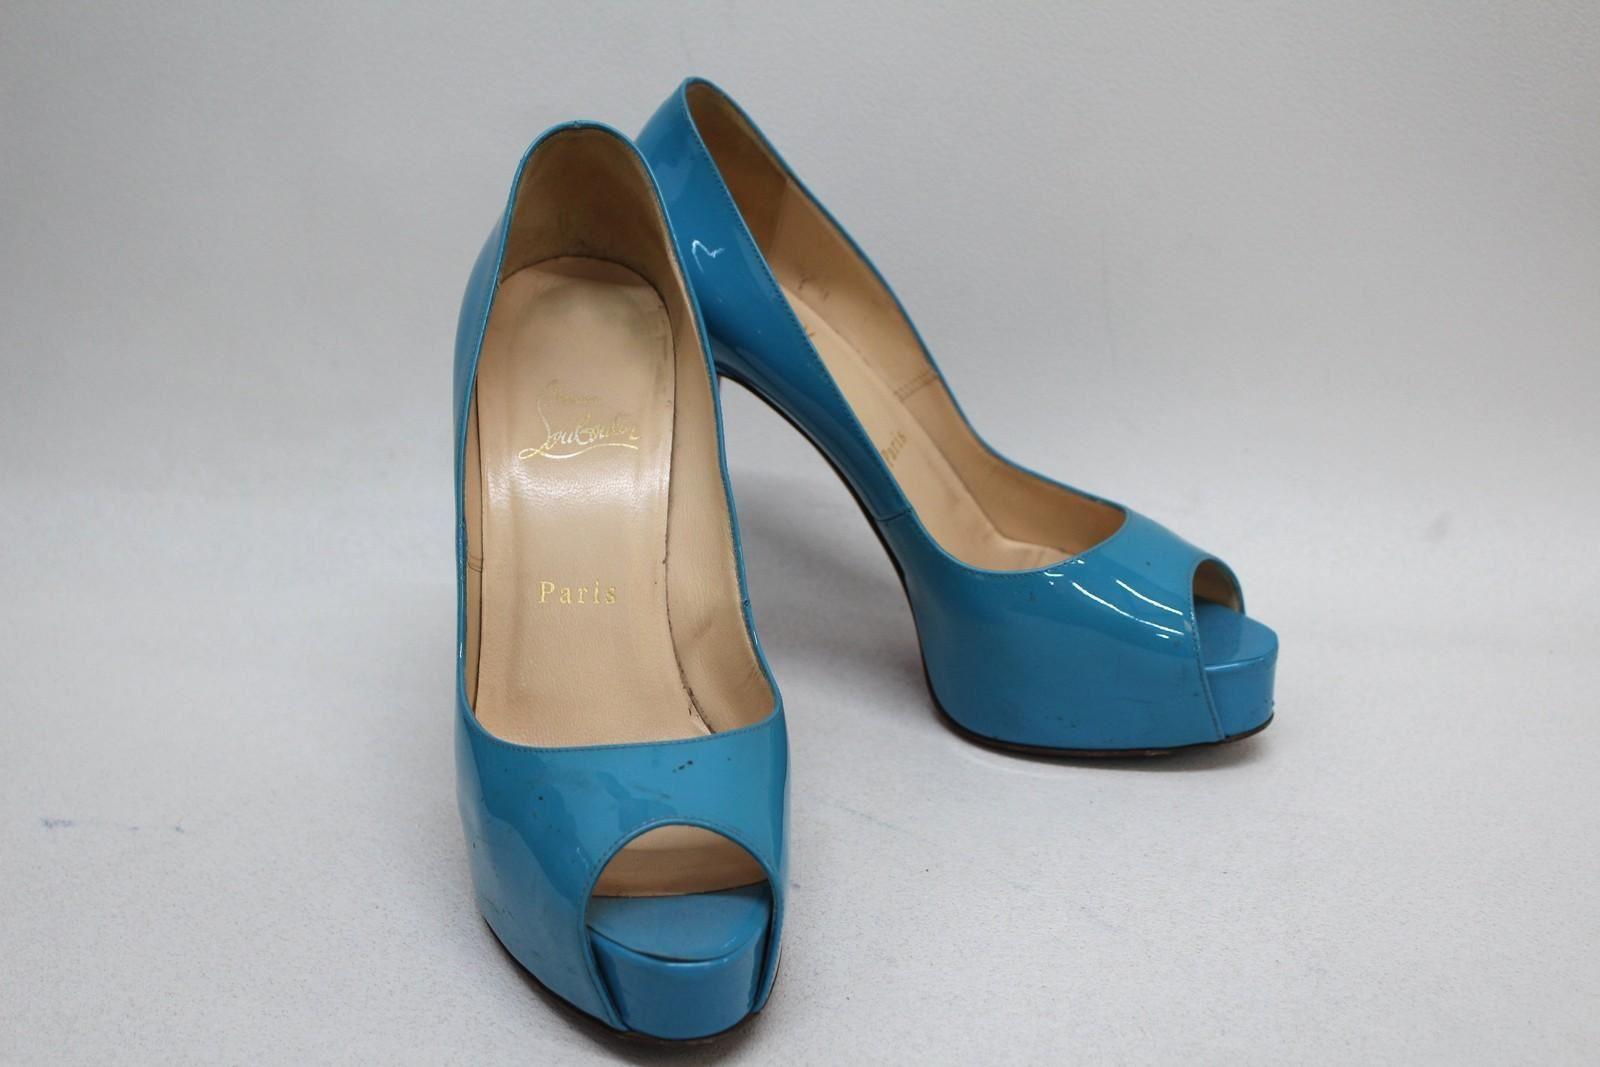 Christian-Louboutin-Damen-Blau-Lackleder-Peep-Toes-Schuhe-Groesse-uk5-eu38